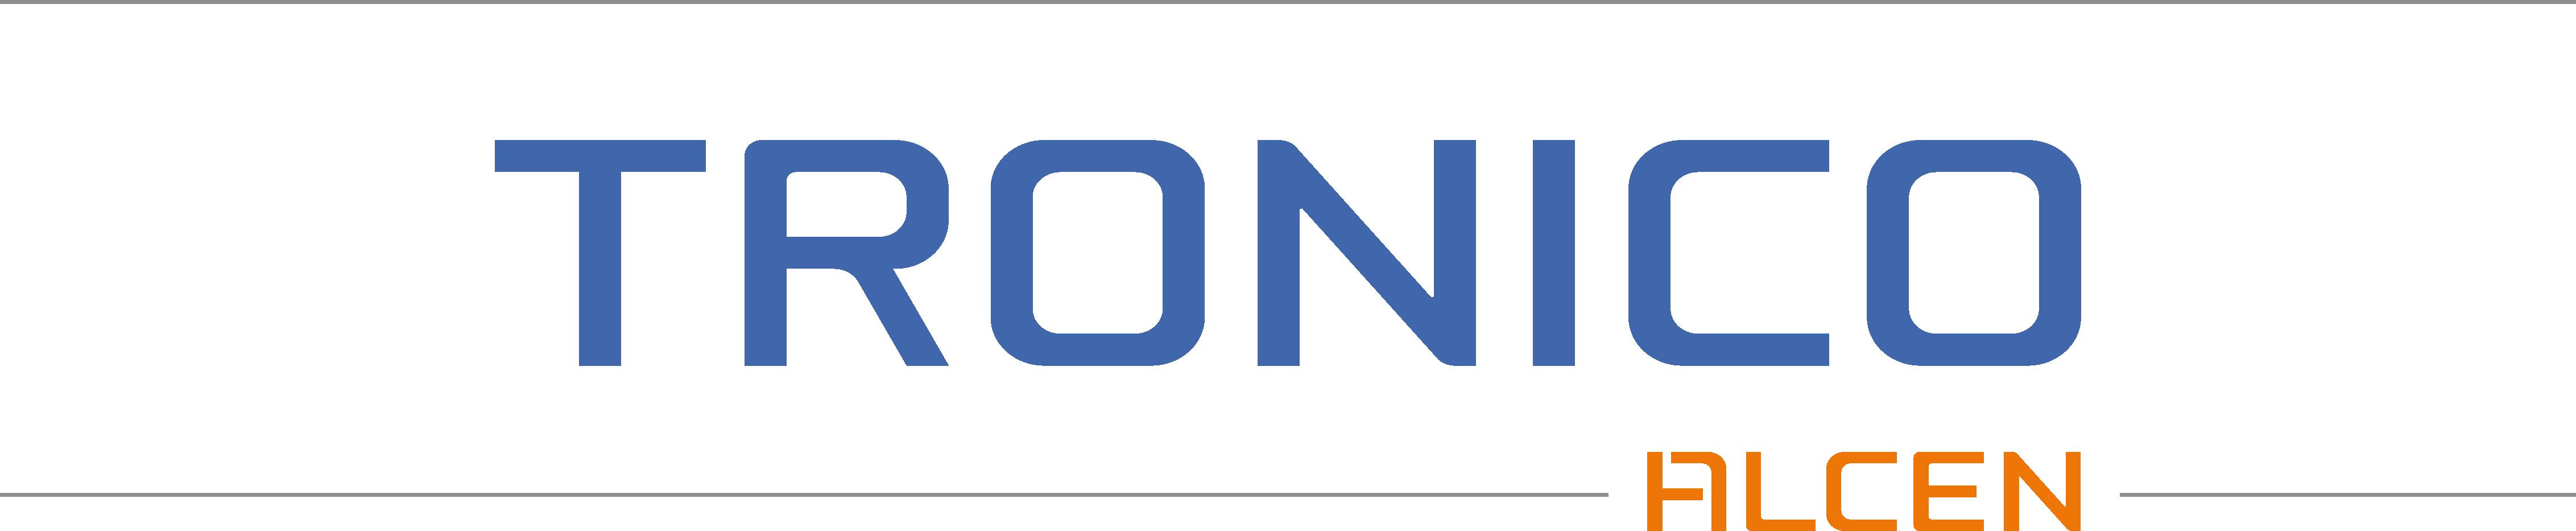 logo tronico